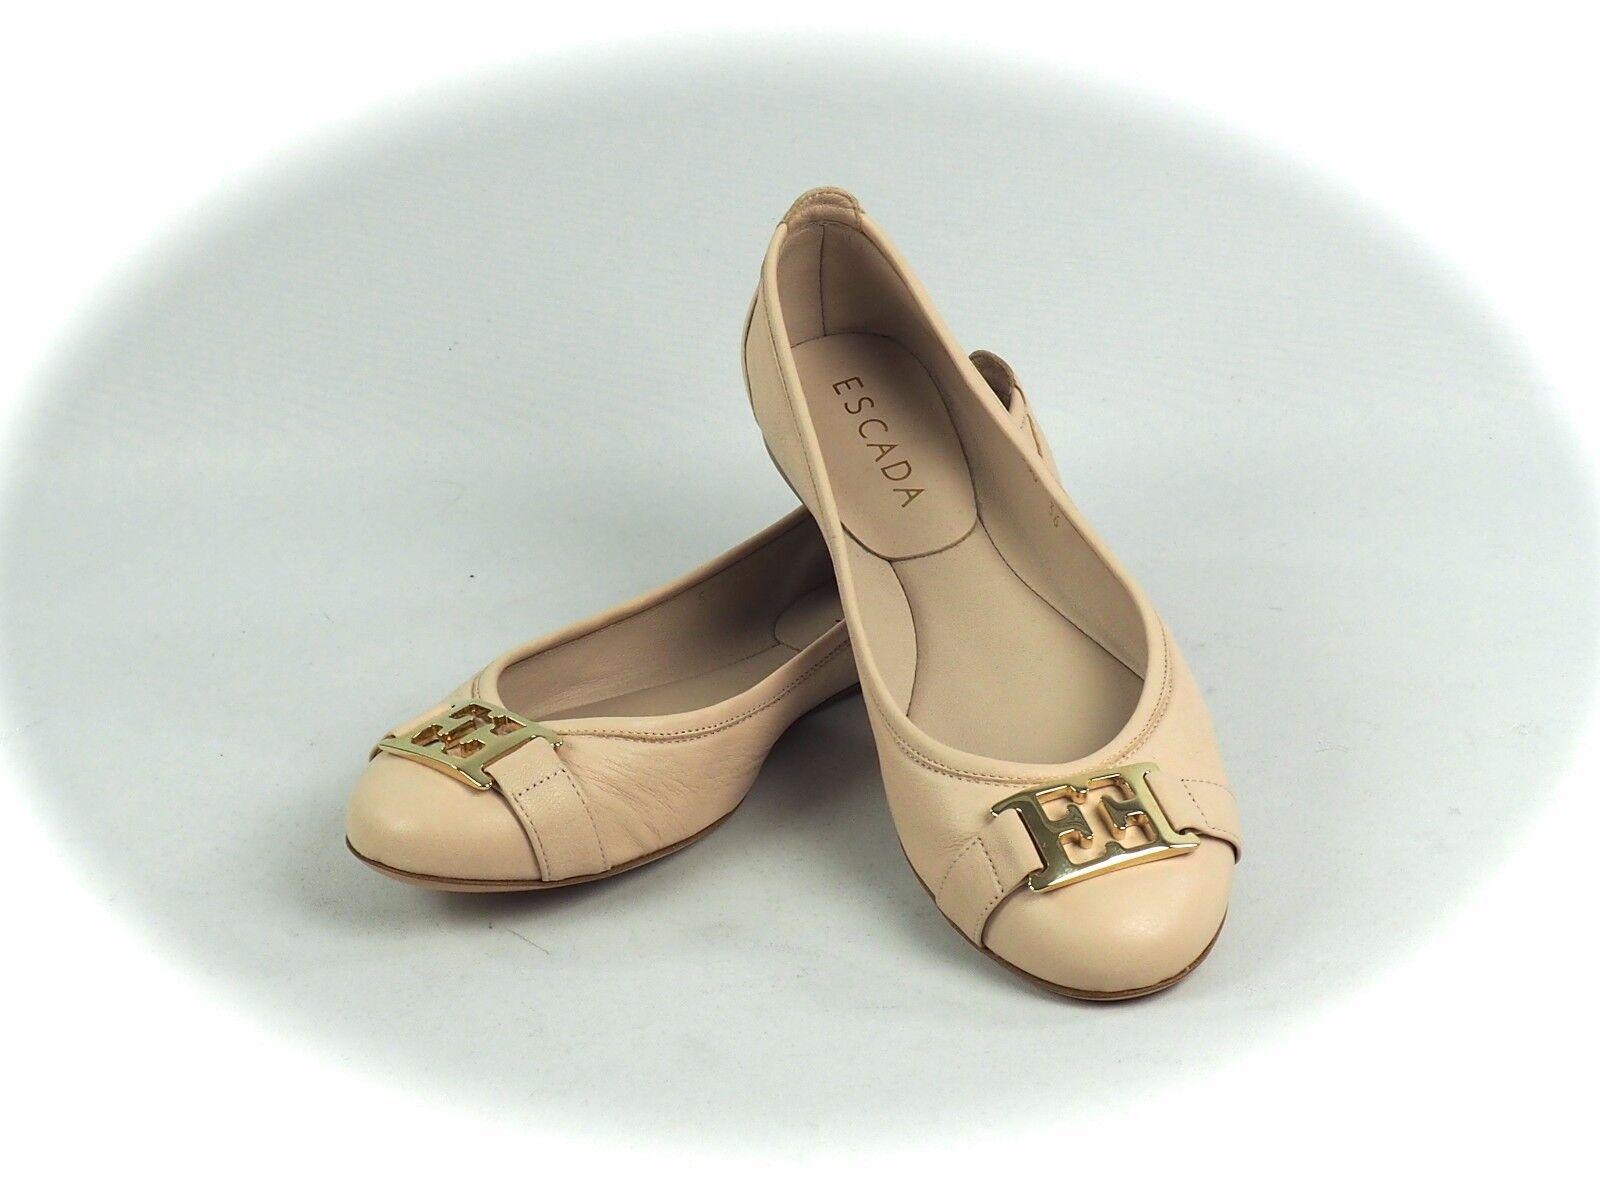 ~ Escada ~ Ballerine/Scarpe in pelle nude tg. 36/38/40/41 NUOVO